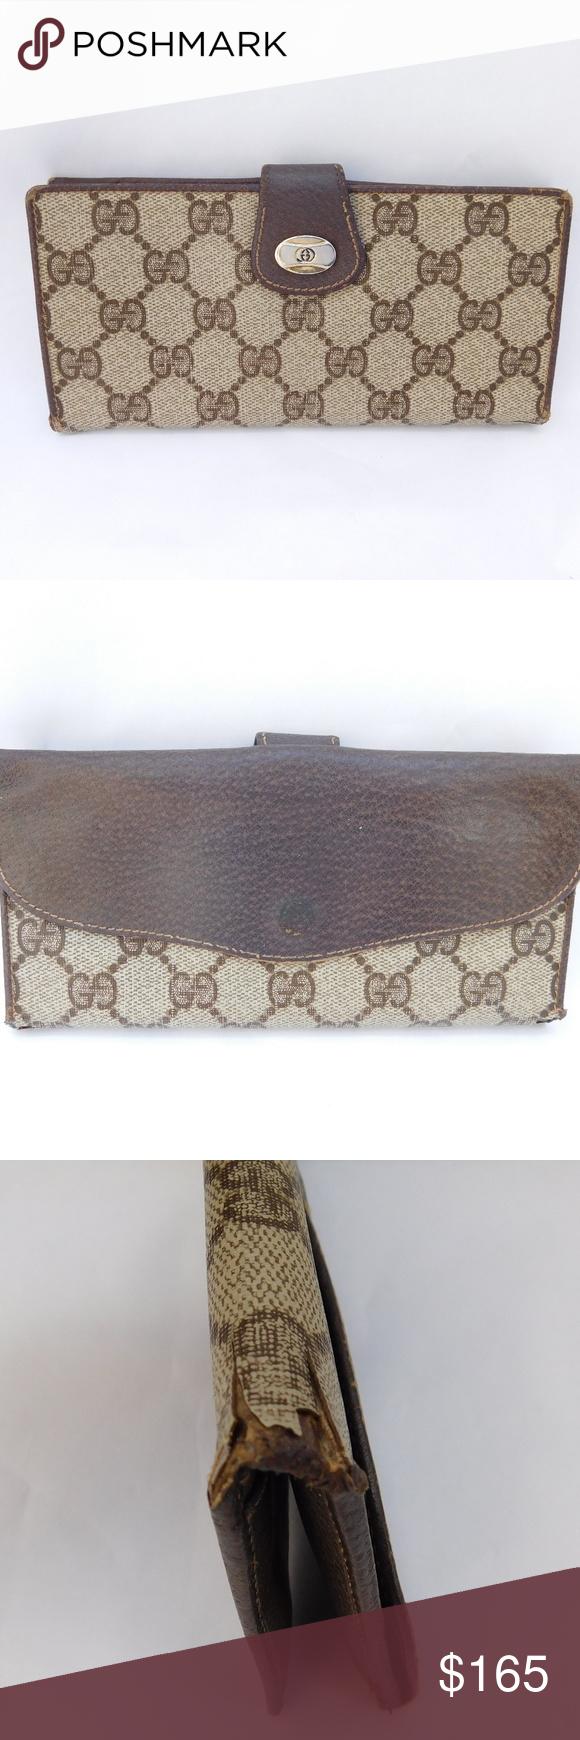 090bebb57b5 Vintage Gucci Monogram GG Canvas Bi-Fold Wallet BRAND- GUCCI COLOR- BROWN  MATERIAL